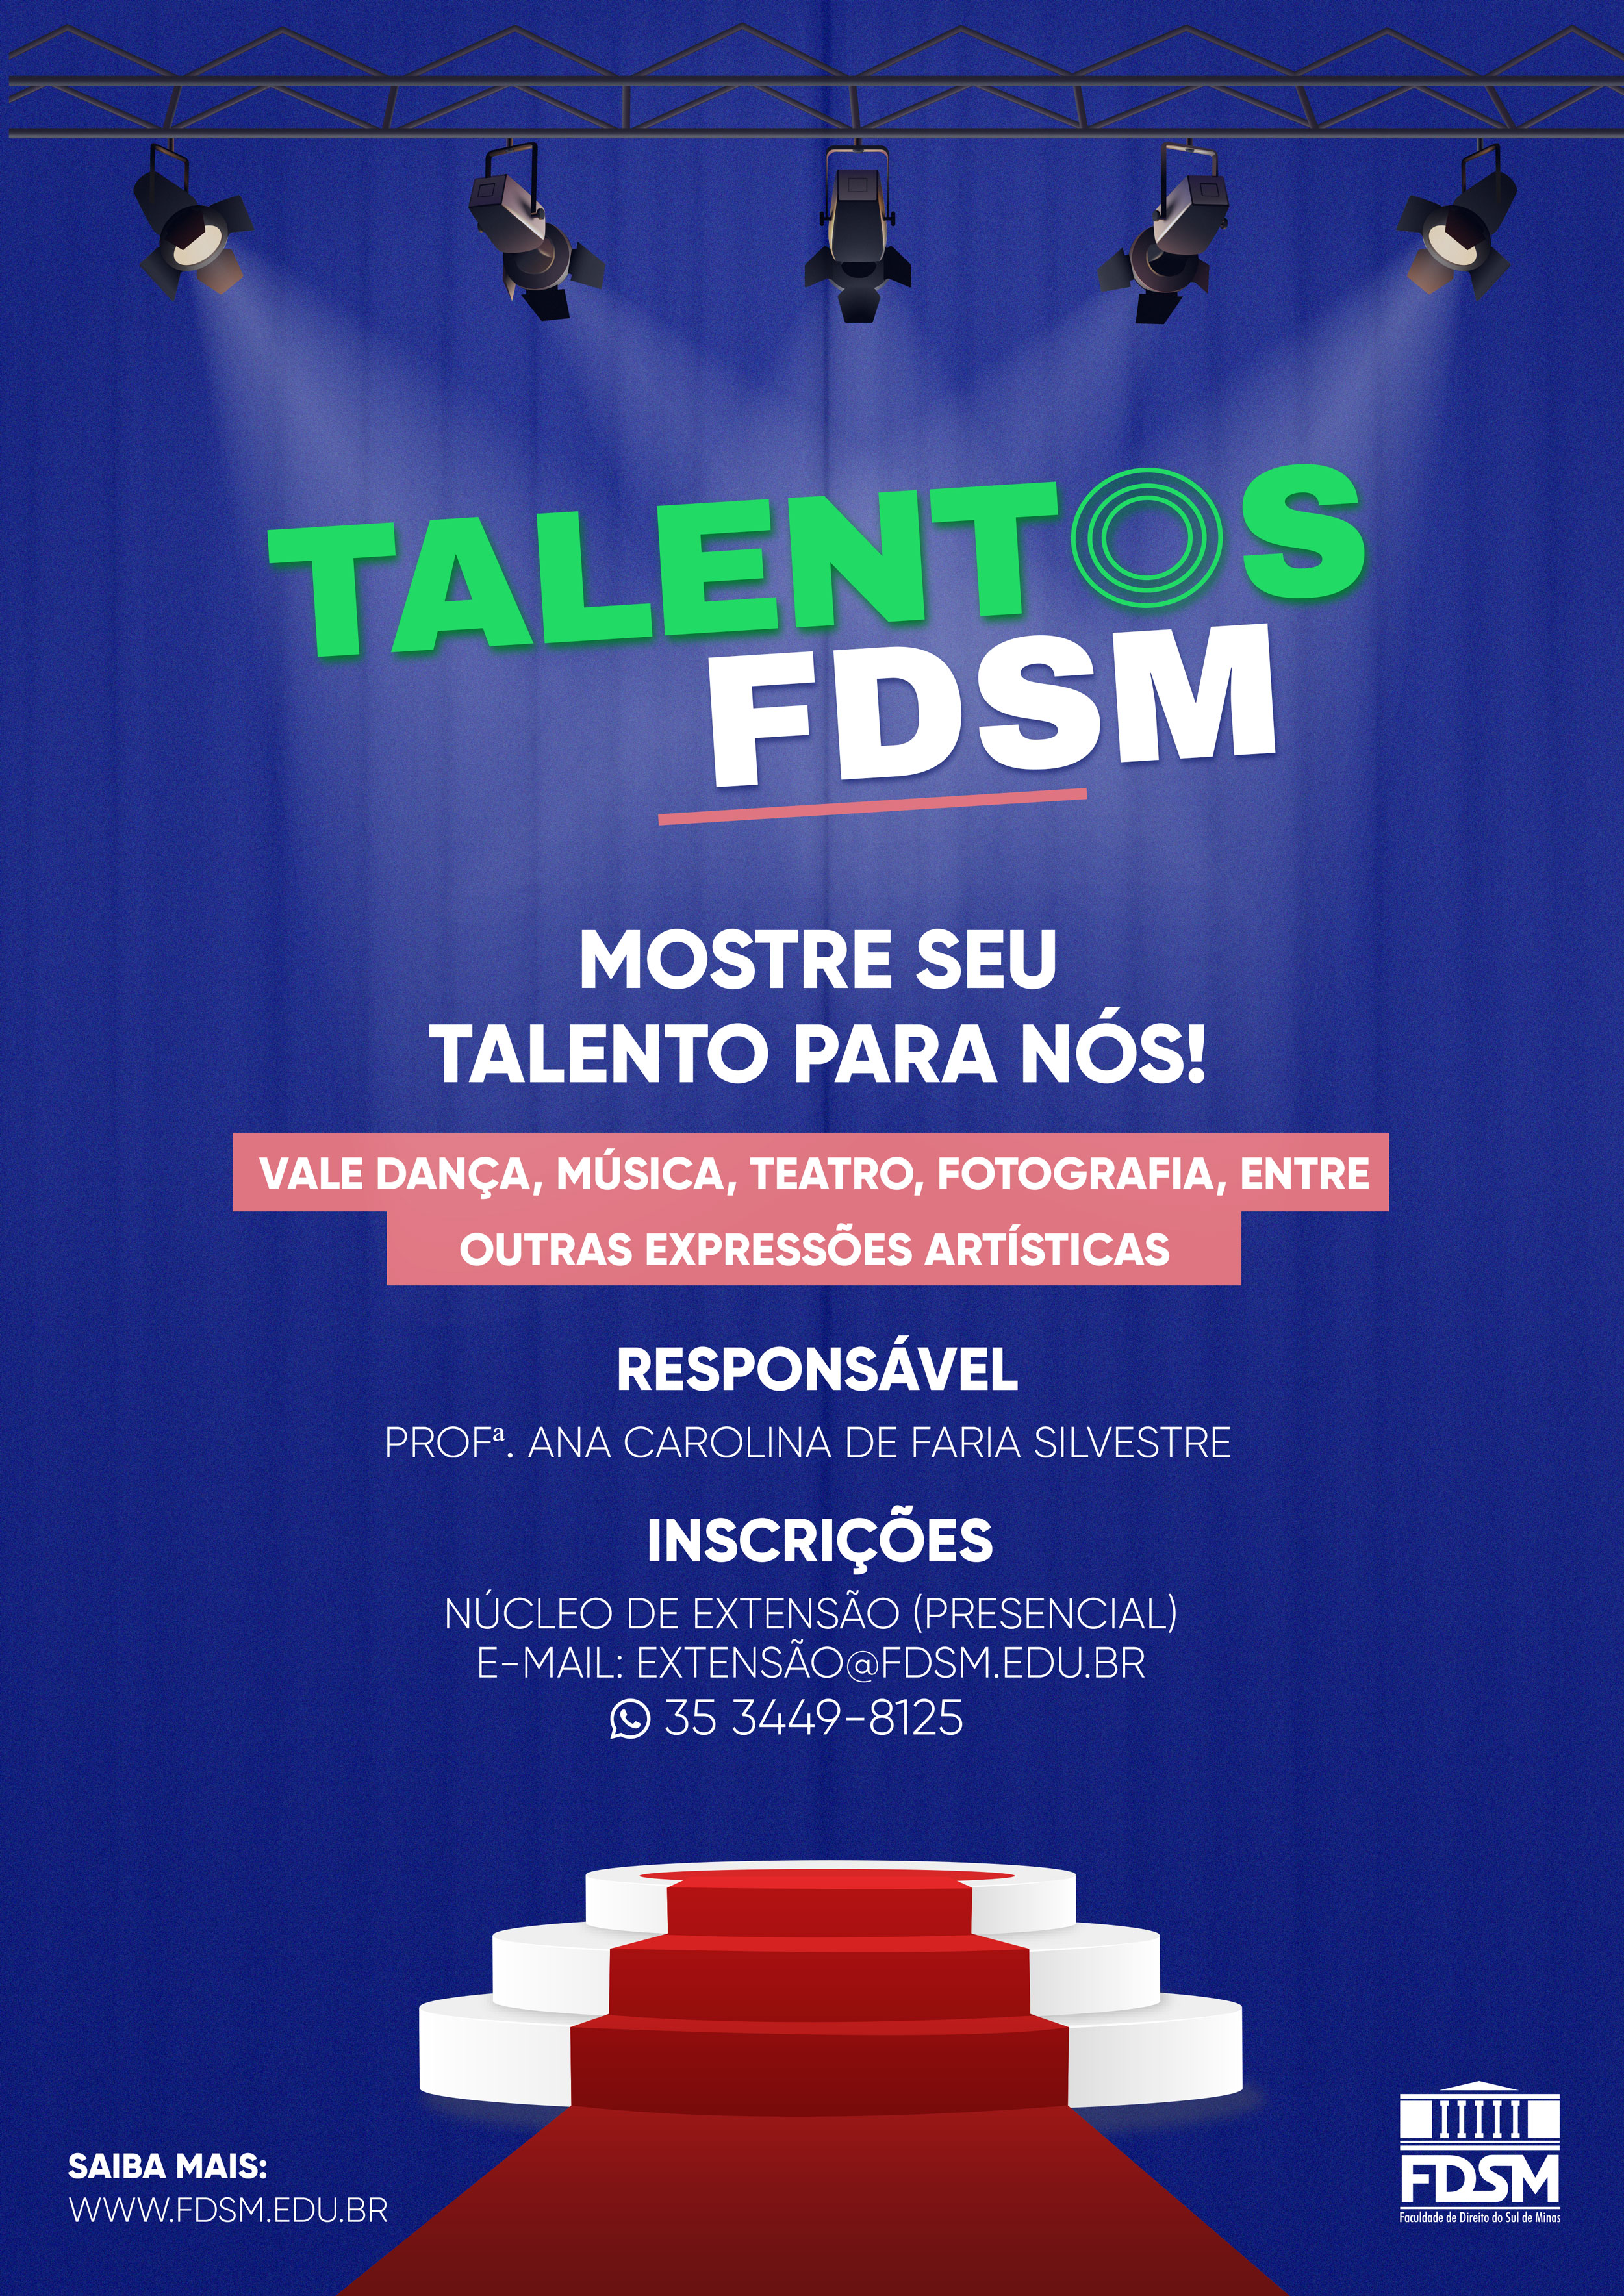 Cód 461: Talentos FDSM